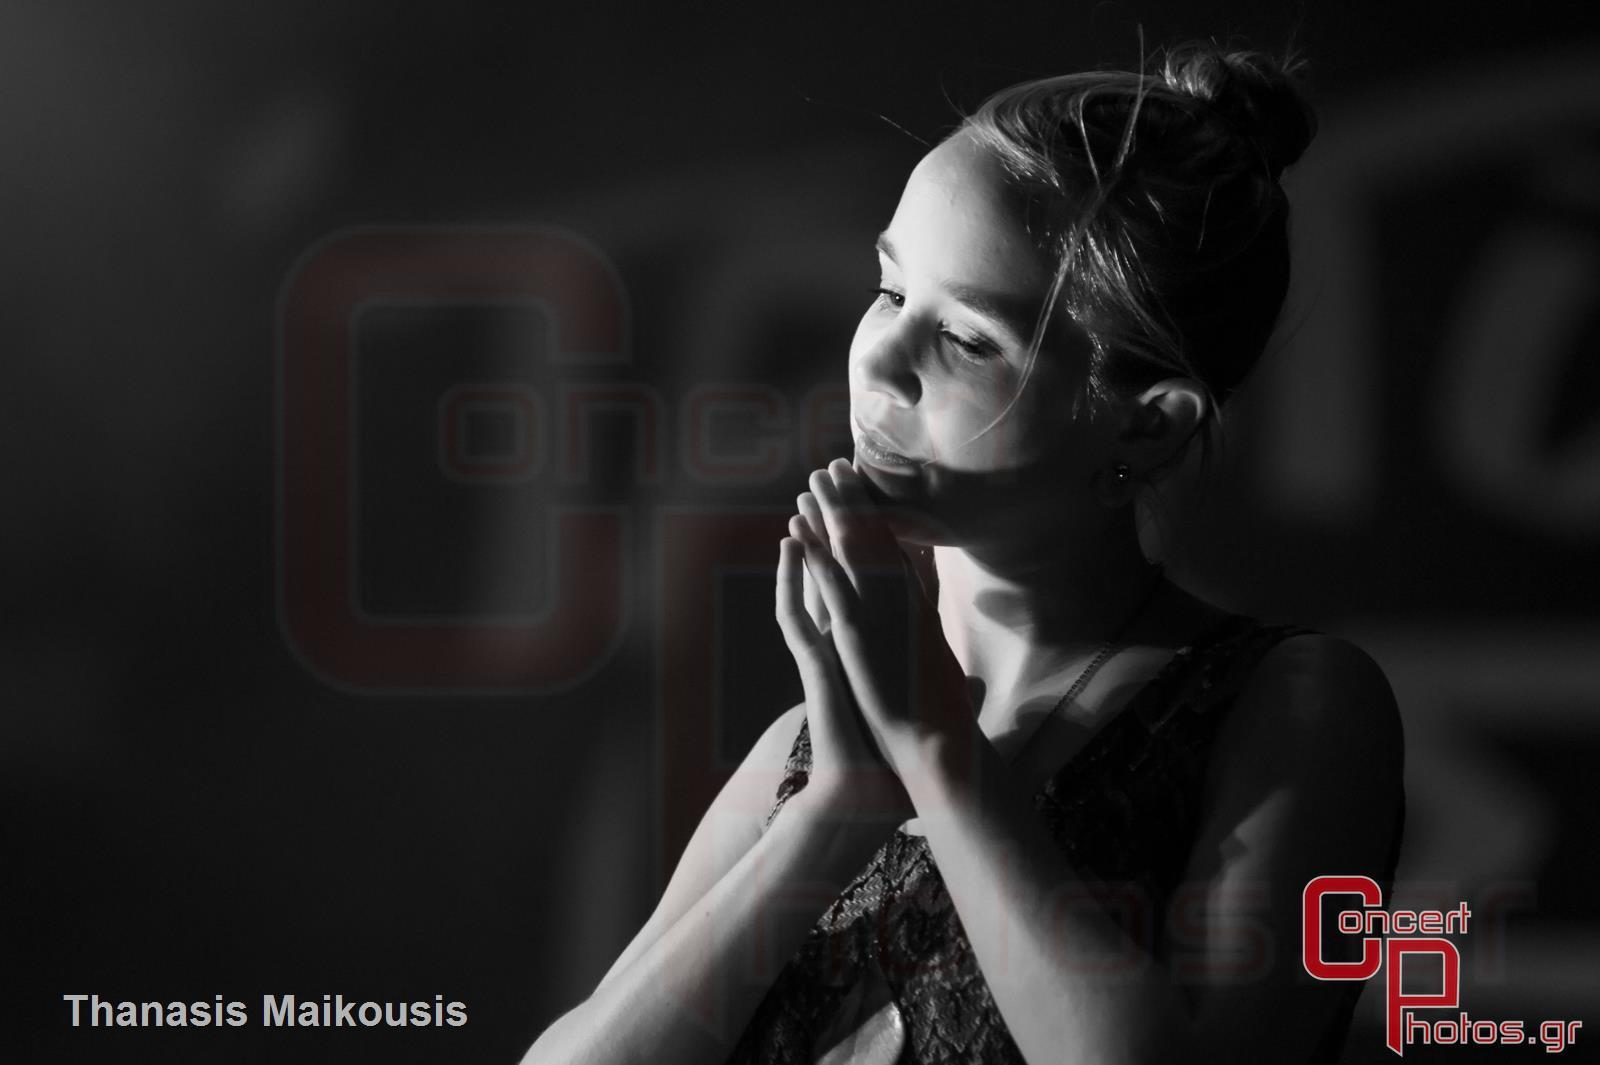 Active Member - Τραγούδα μας να φύγει το σκοτάδι- photographer: Thanasis Maikousis - concertphotos_-5512